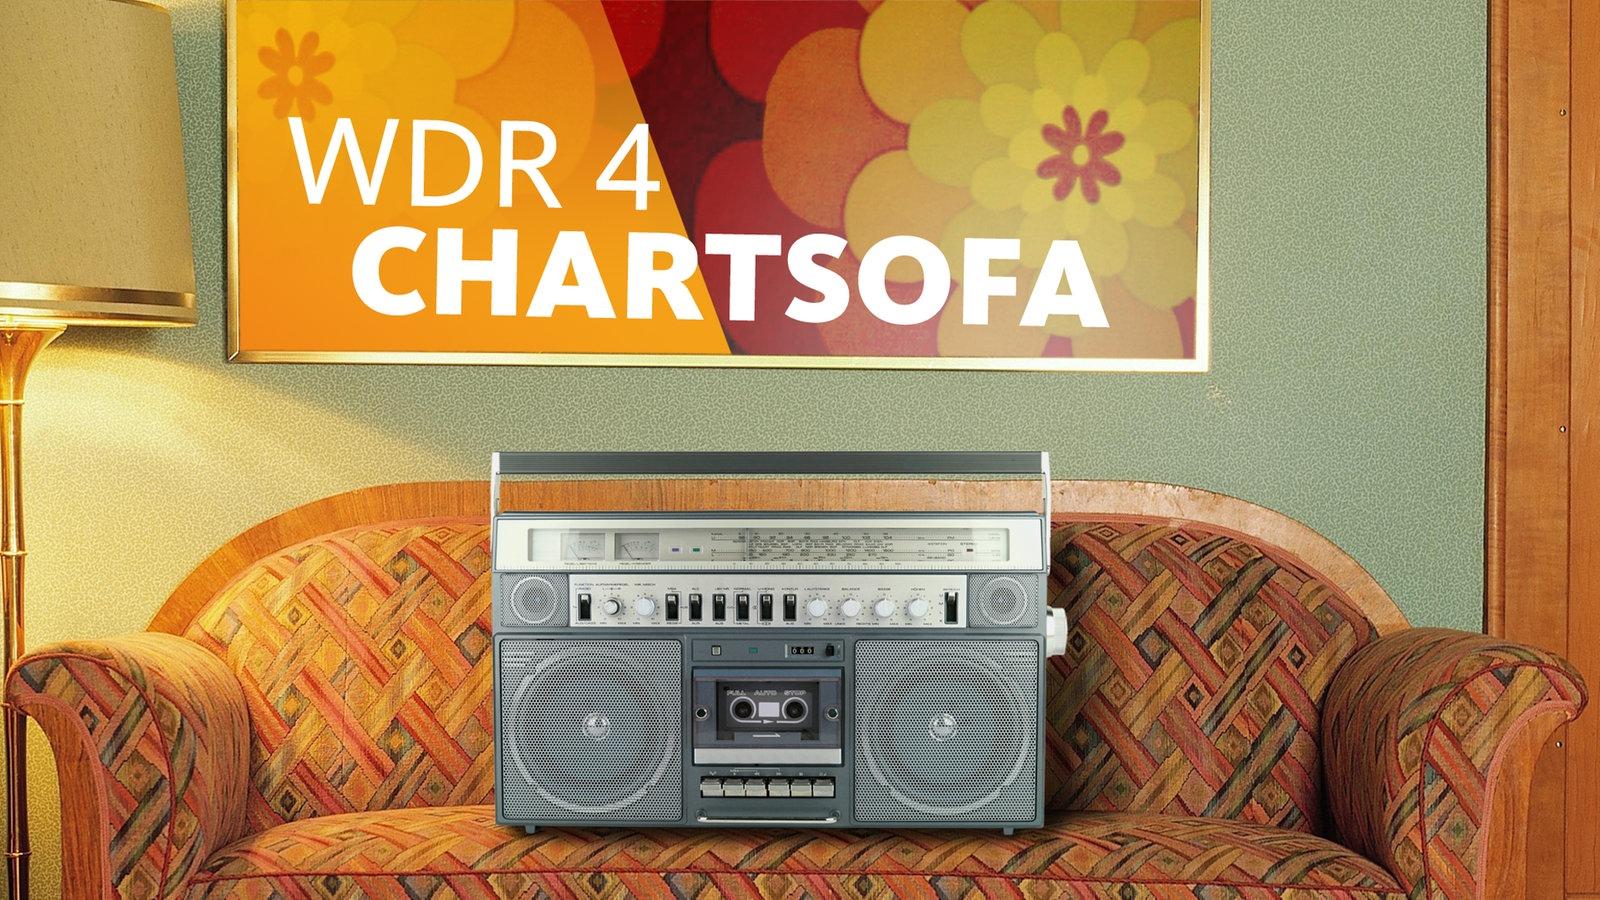 Wdr4 Programm